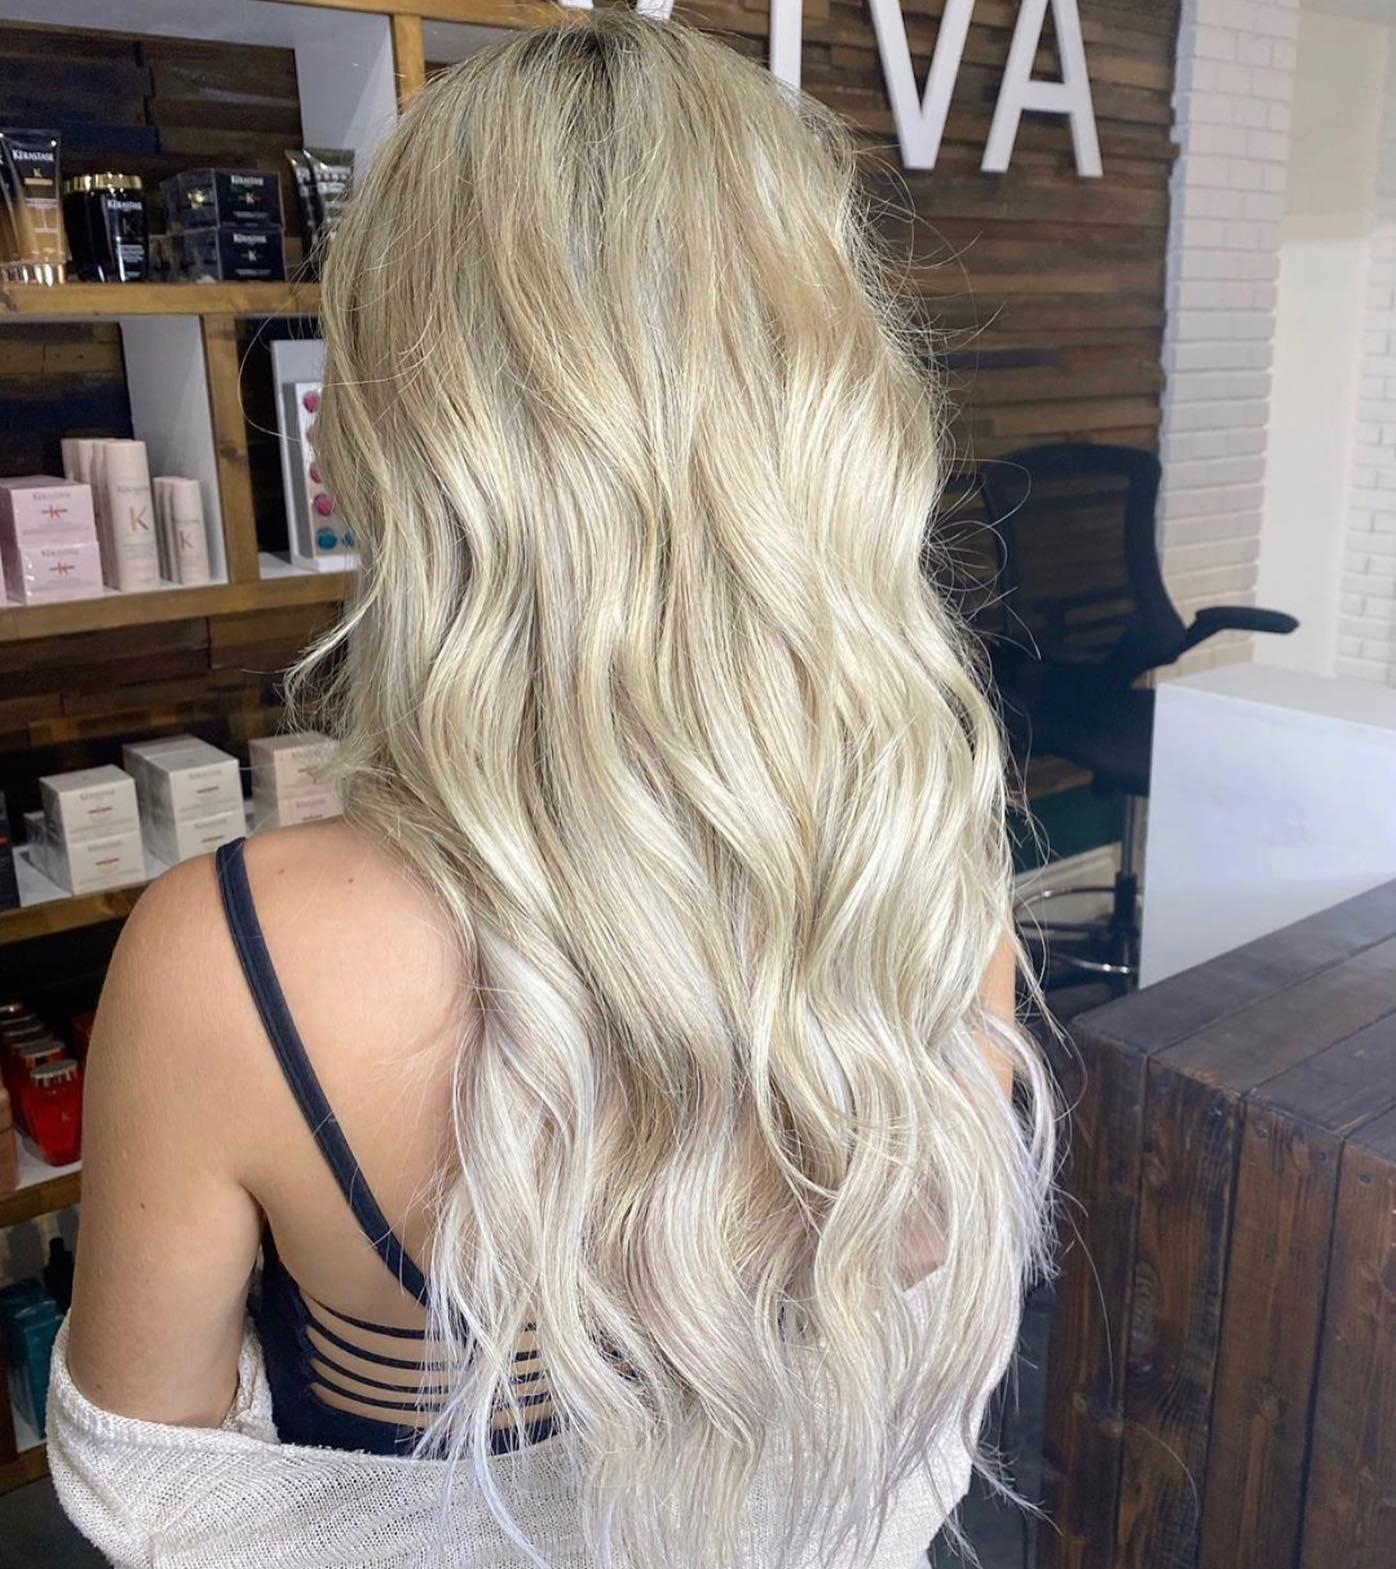 Best Salon for Curly Hair in Las Vegas